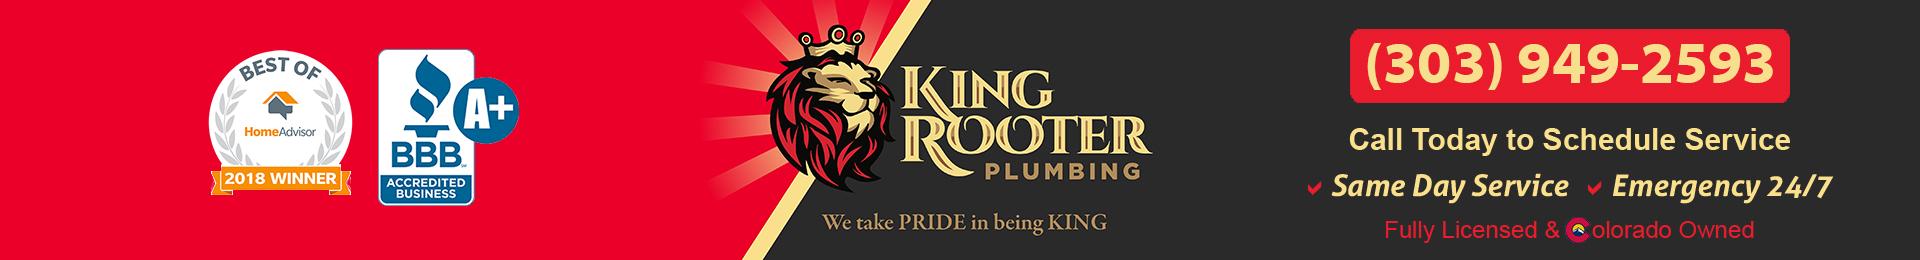 We Take PRIDE in being KING